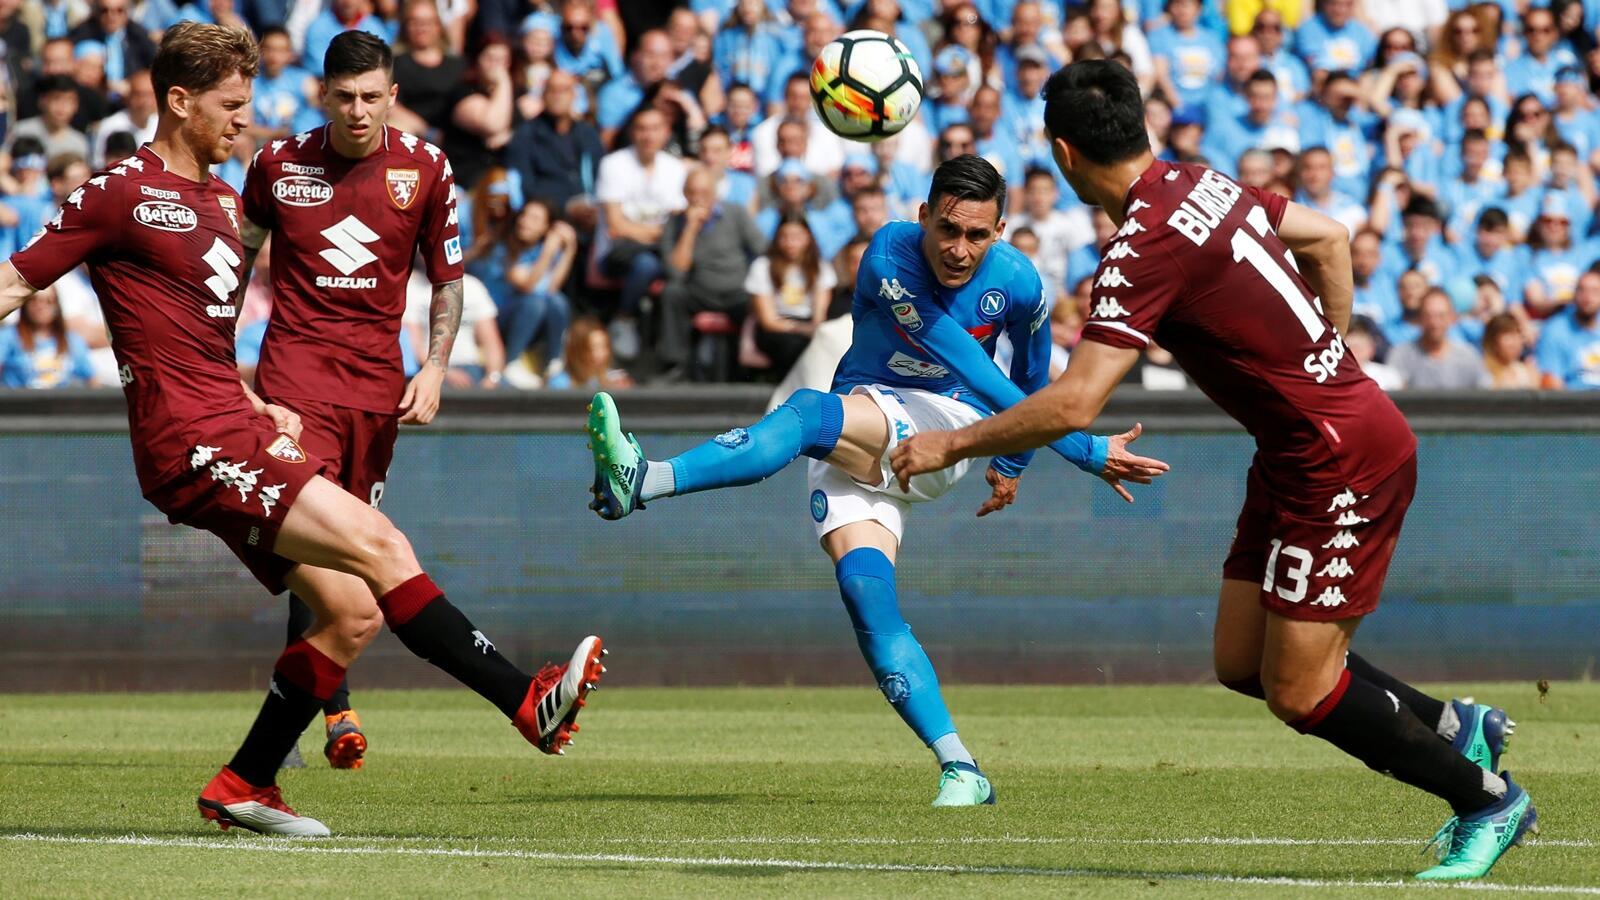 Imbang dengan Torino, Peluang Juara Napoli Kian Tipis